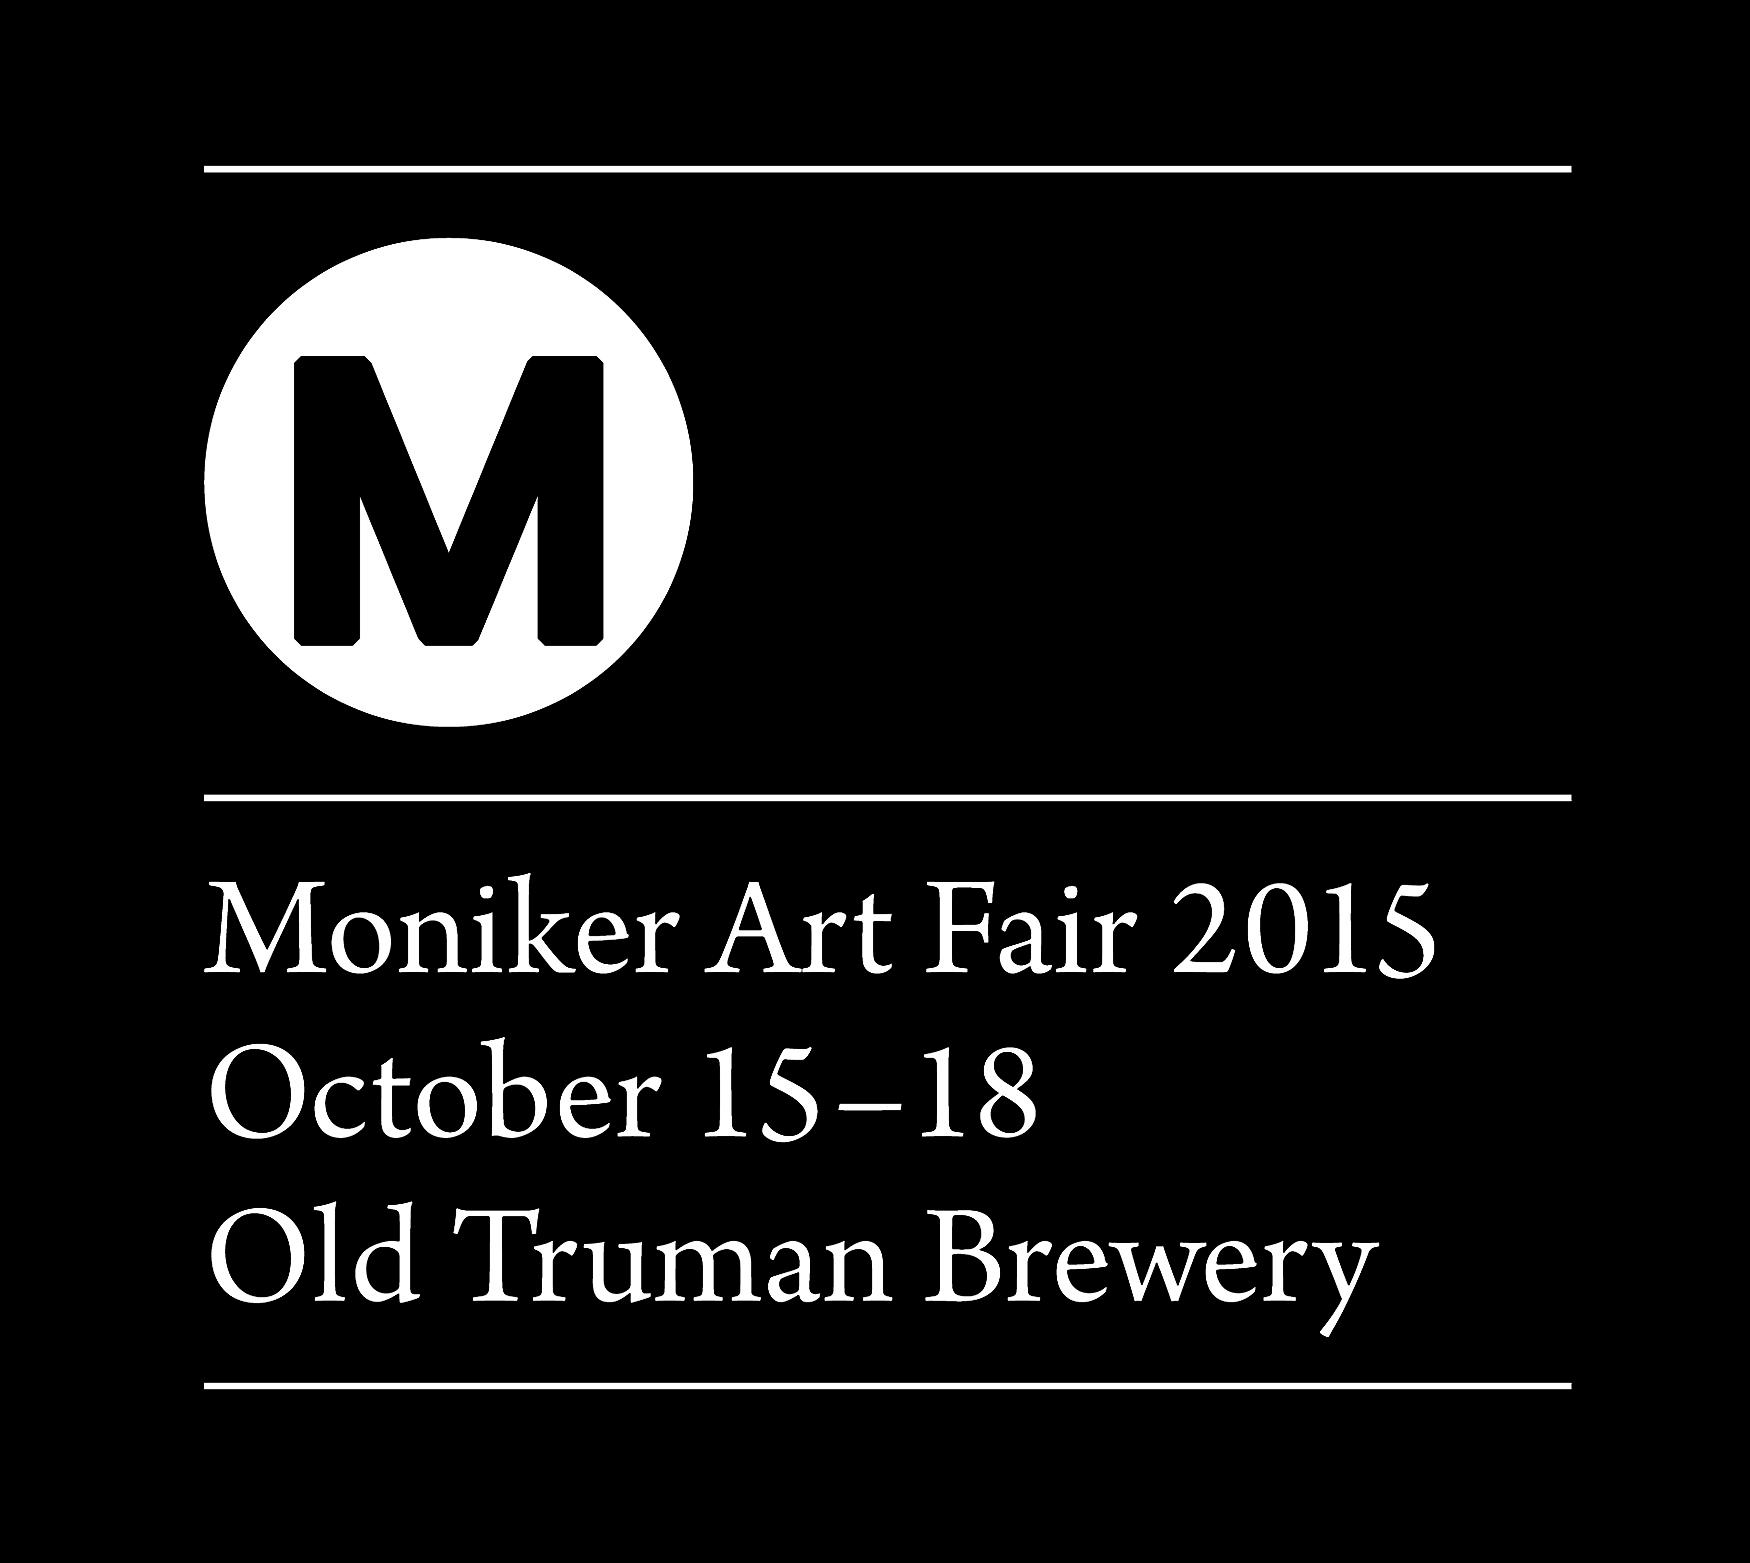 moniker-art-fair-2015-wht-on-blk.jpg